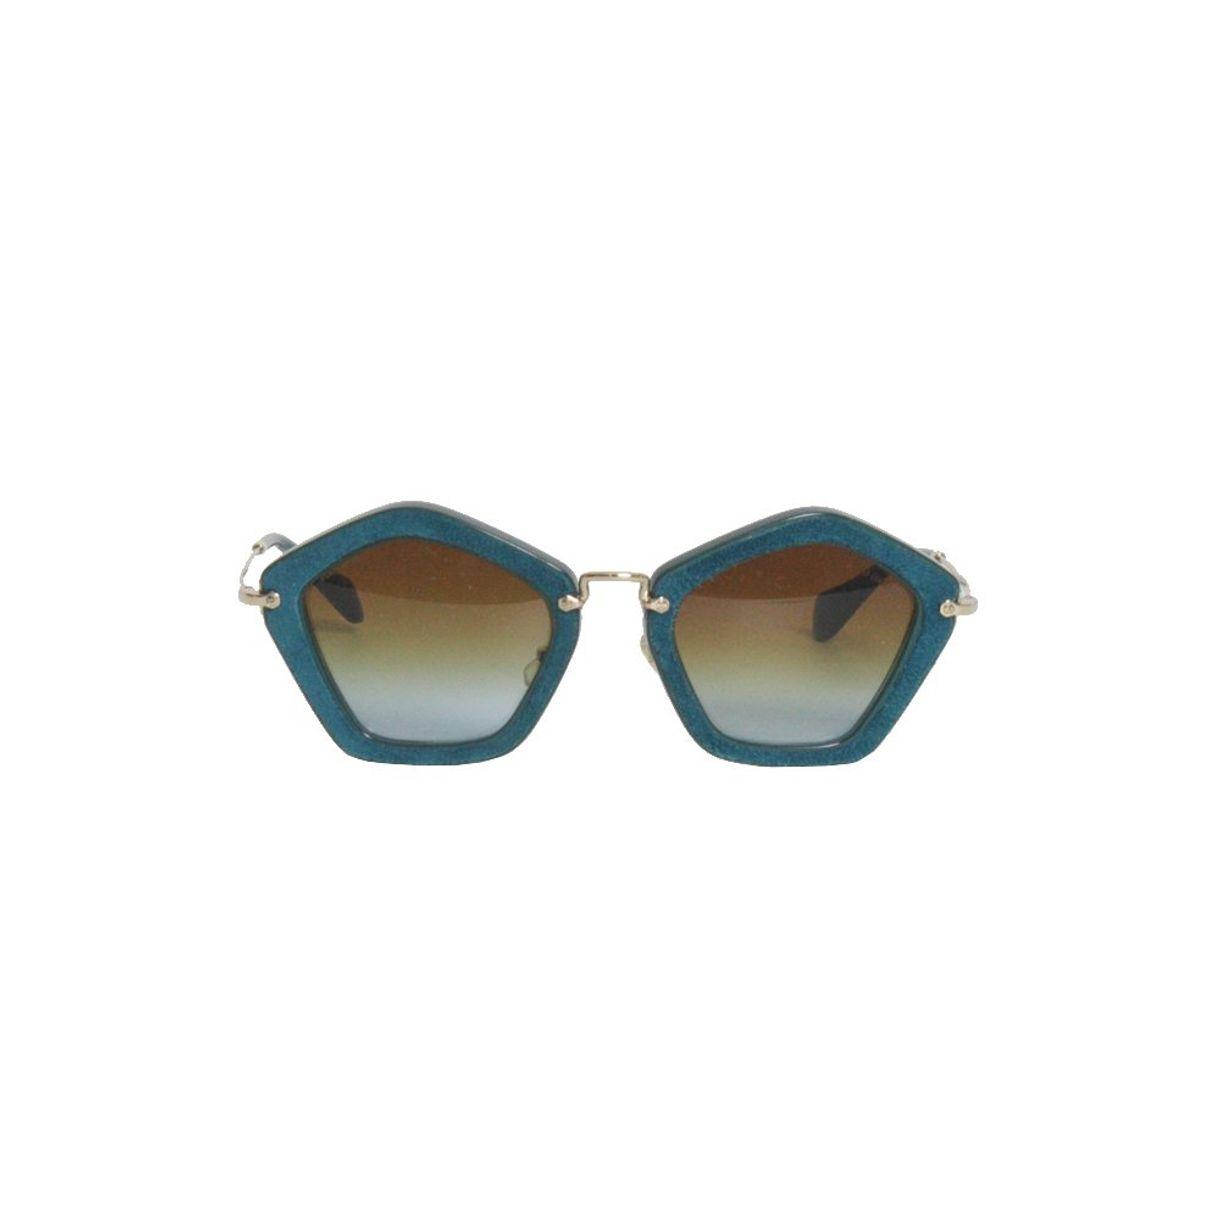 oculos-miu-miu-havana-camurca-turquesa